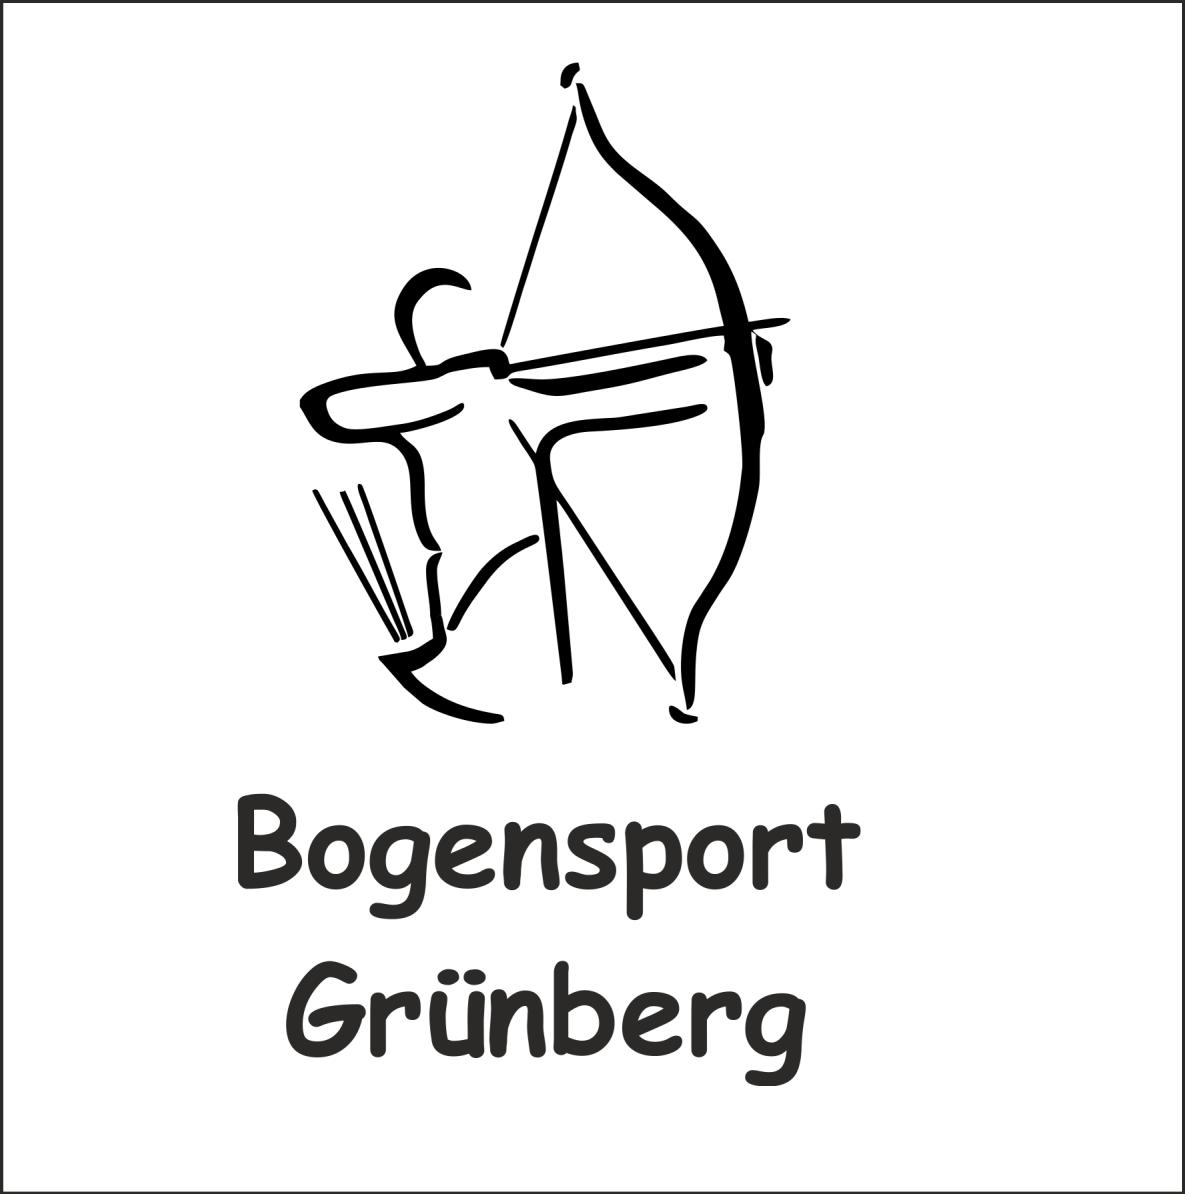 Bogensport Grünberg